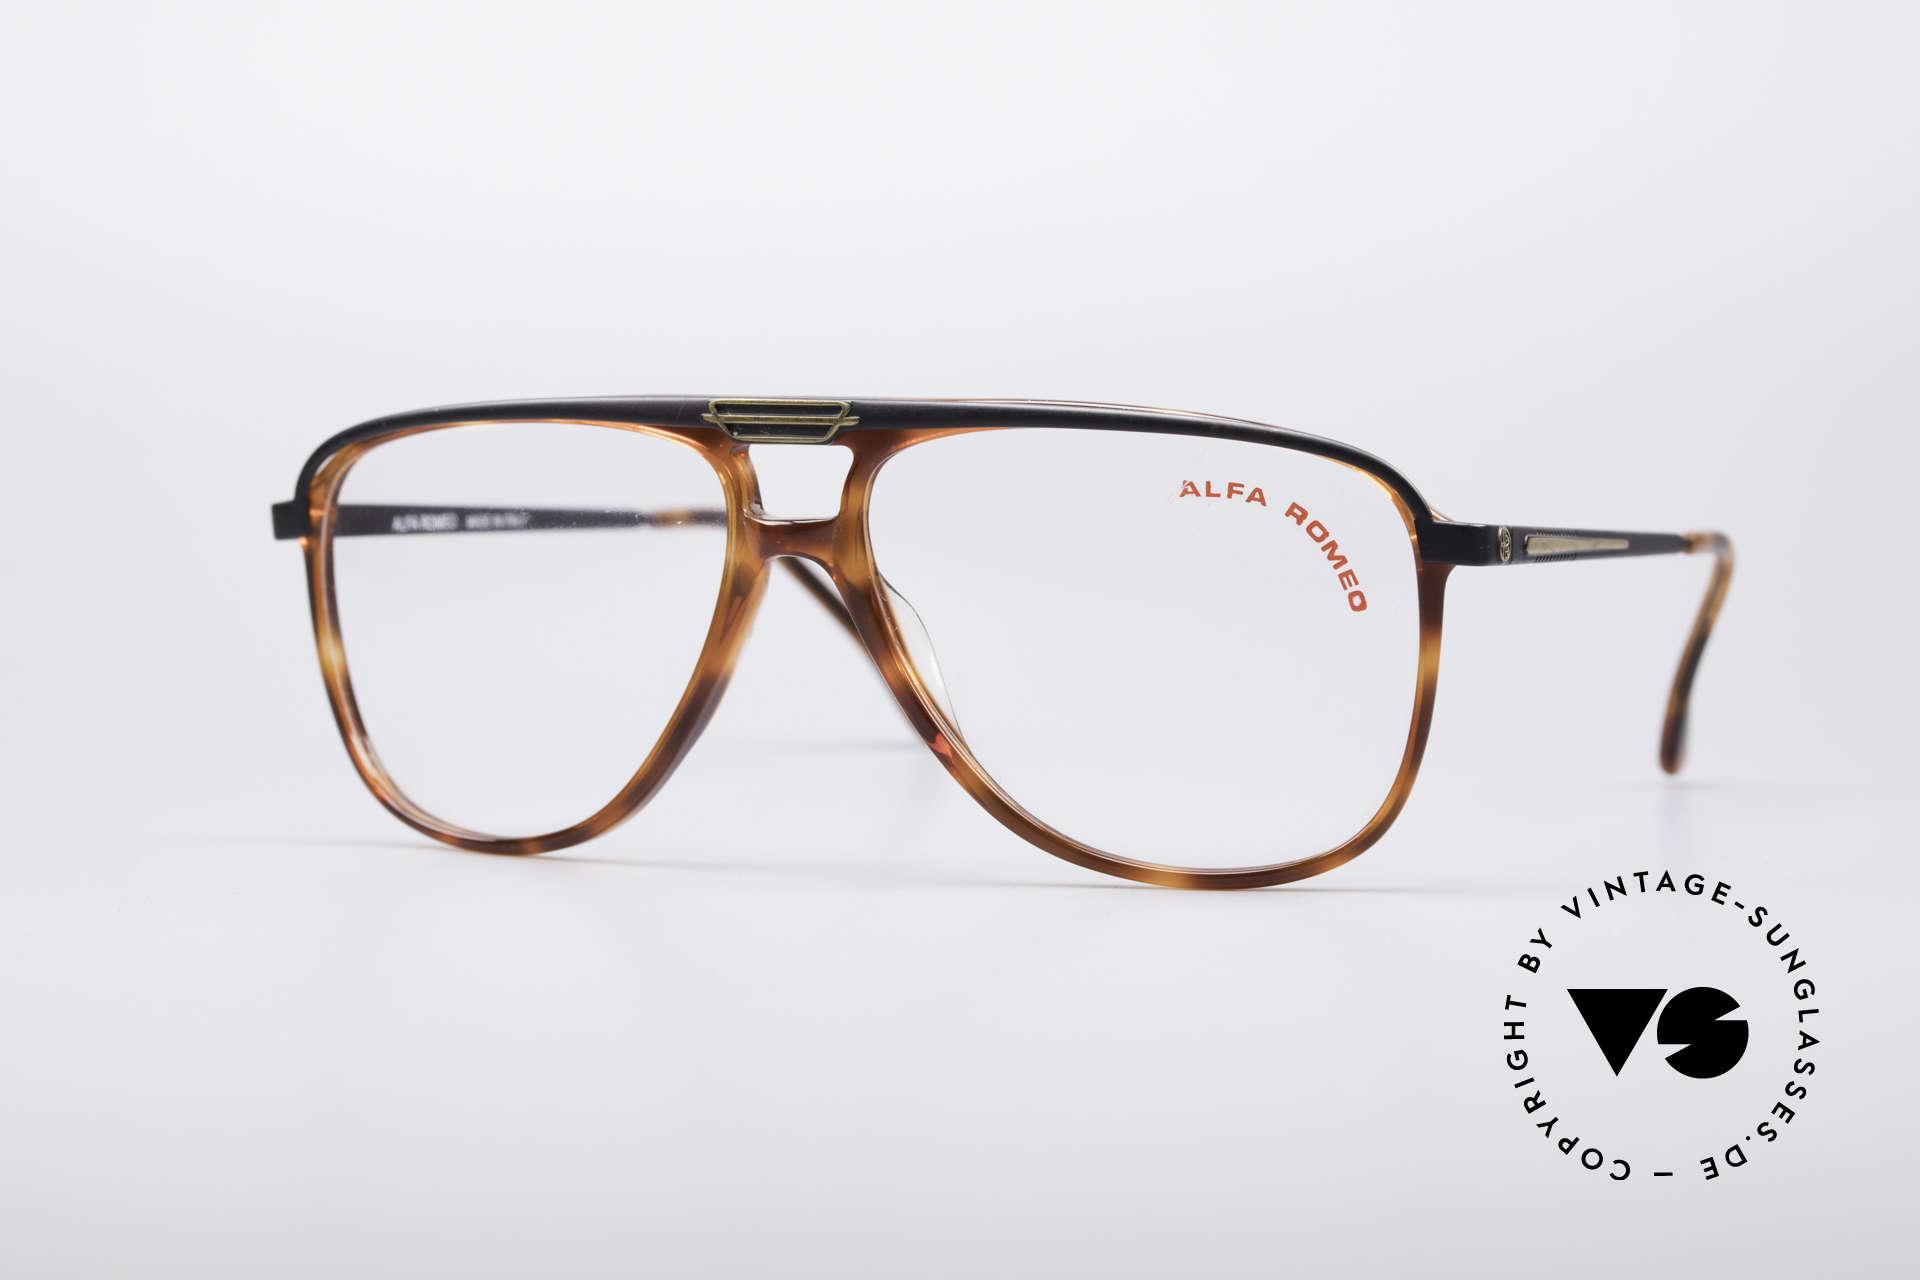 Alfa Romeo 95-22 Alfisti Vintage Frame, luxury Italian vintage designer glasses by Alfa Romeo, Made for Men